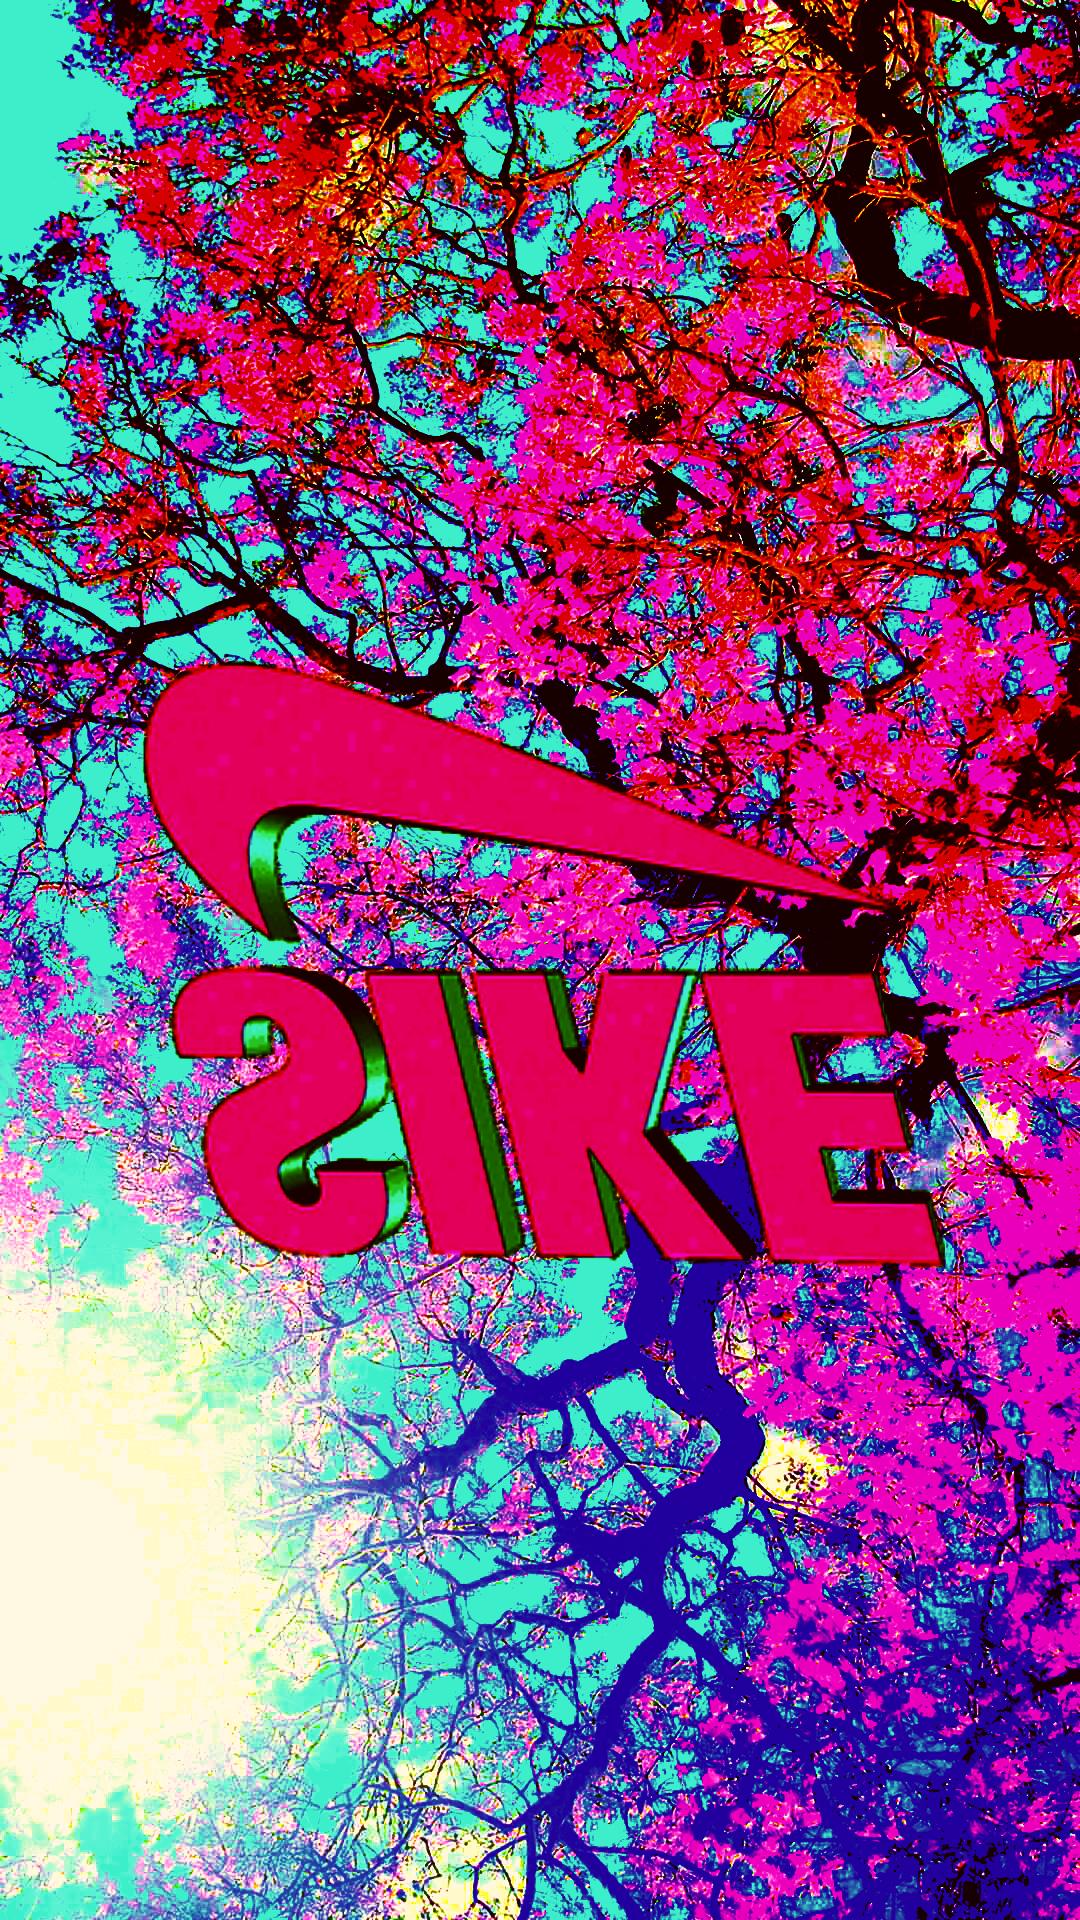 freetoedit wallpaper brand Nike vaporwave aesthetic dop...